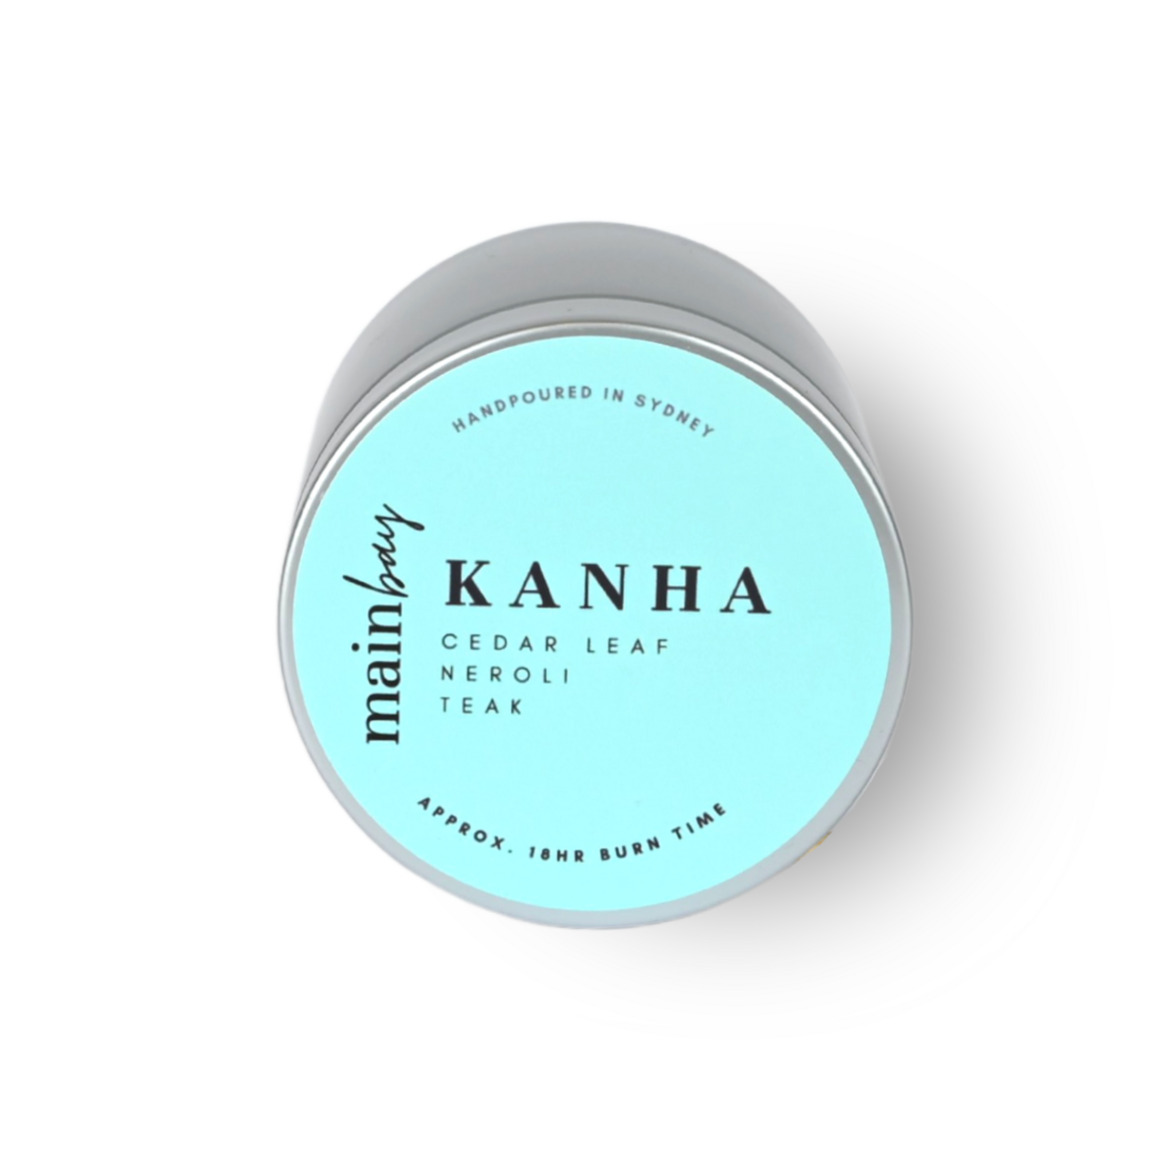 Kanha | Neroli, Cedar Leaf, Teak | Tin Collection | Trada Marketplace